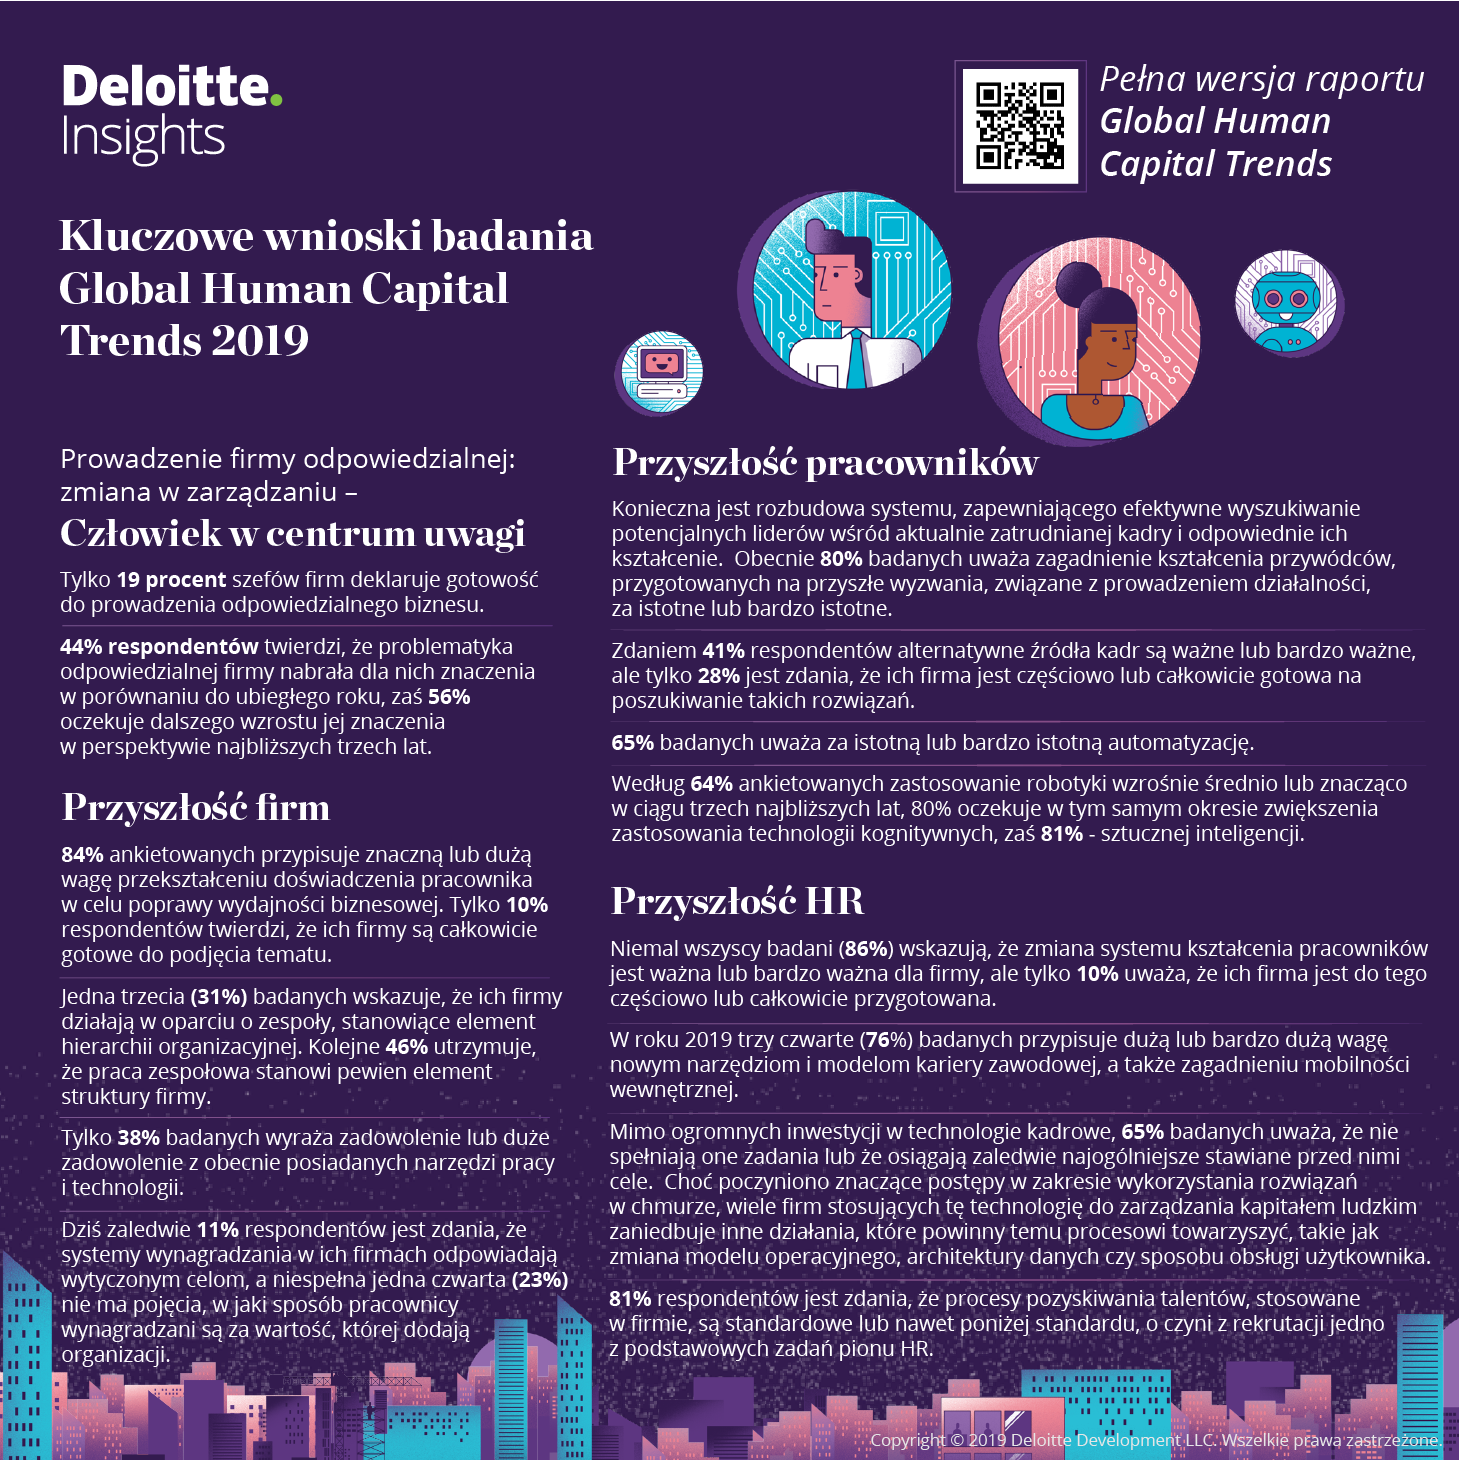 (źródło: Deloitte Global Human Capital Trends)